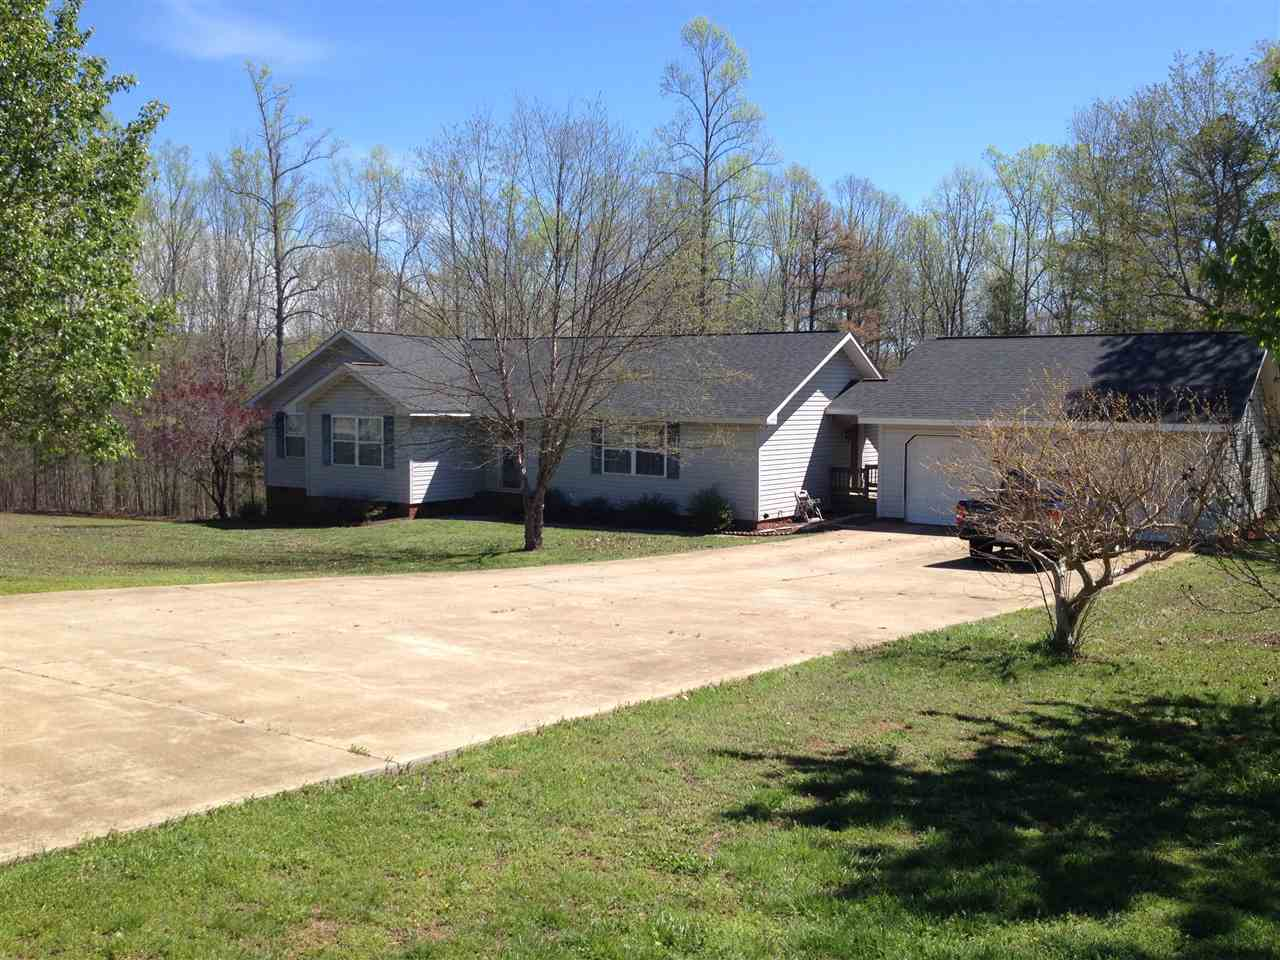 212 Bent Tree Drive, Rutherfordton, NC 28139